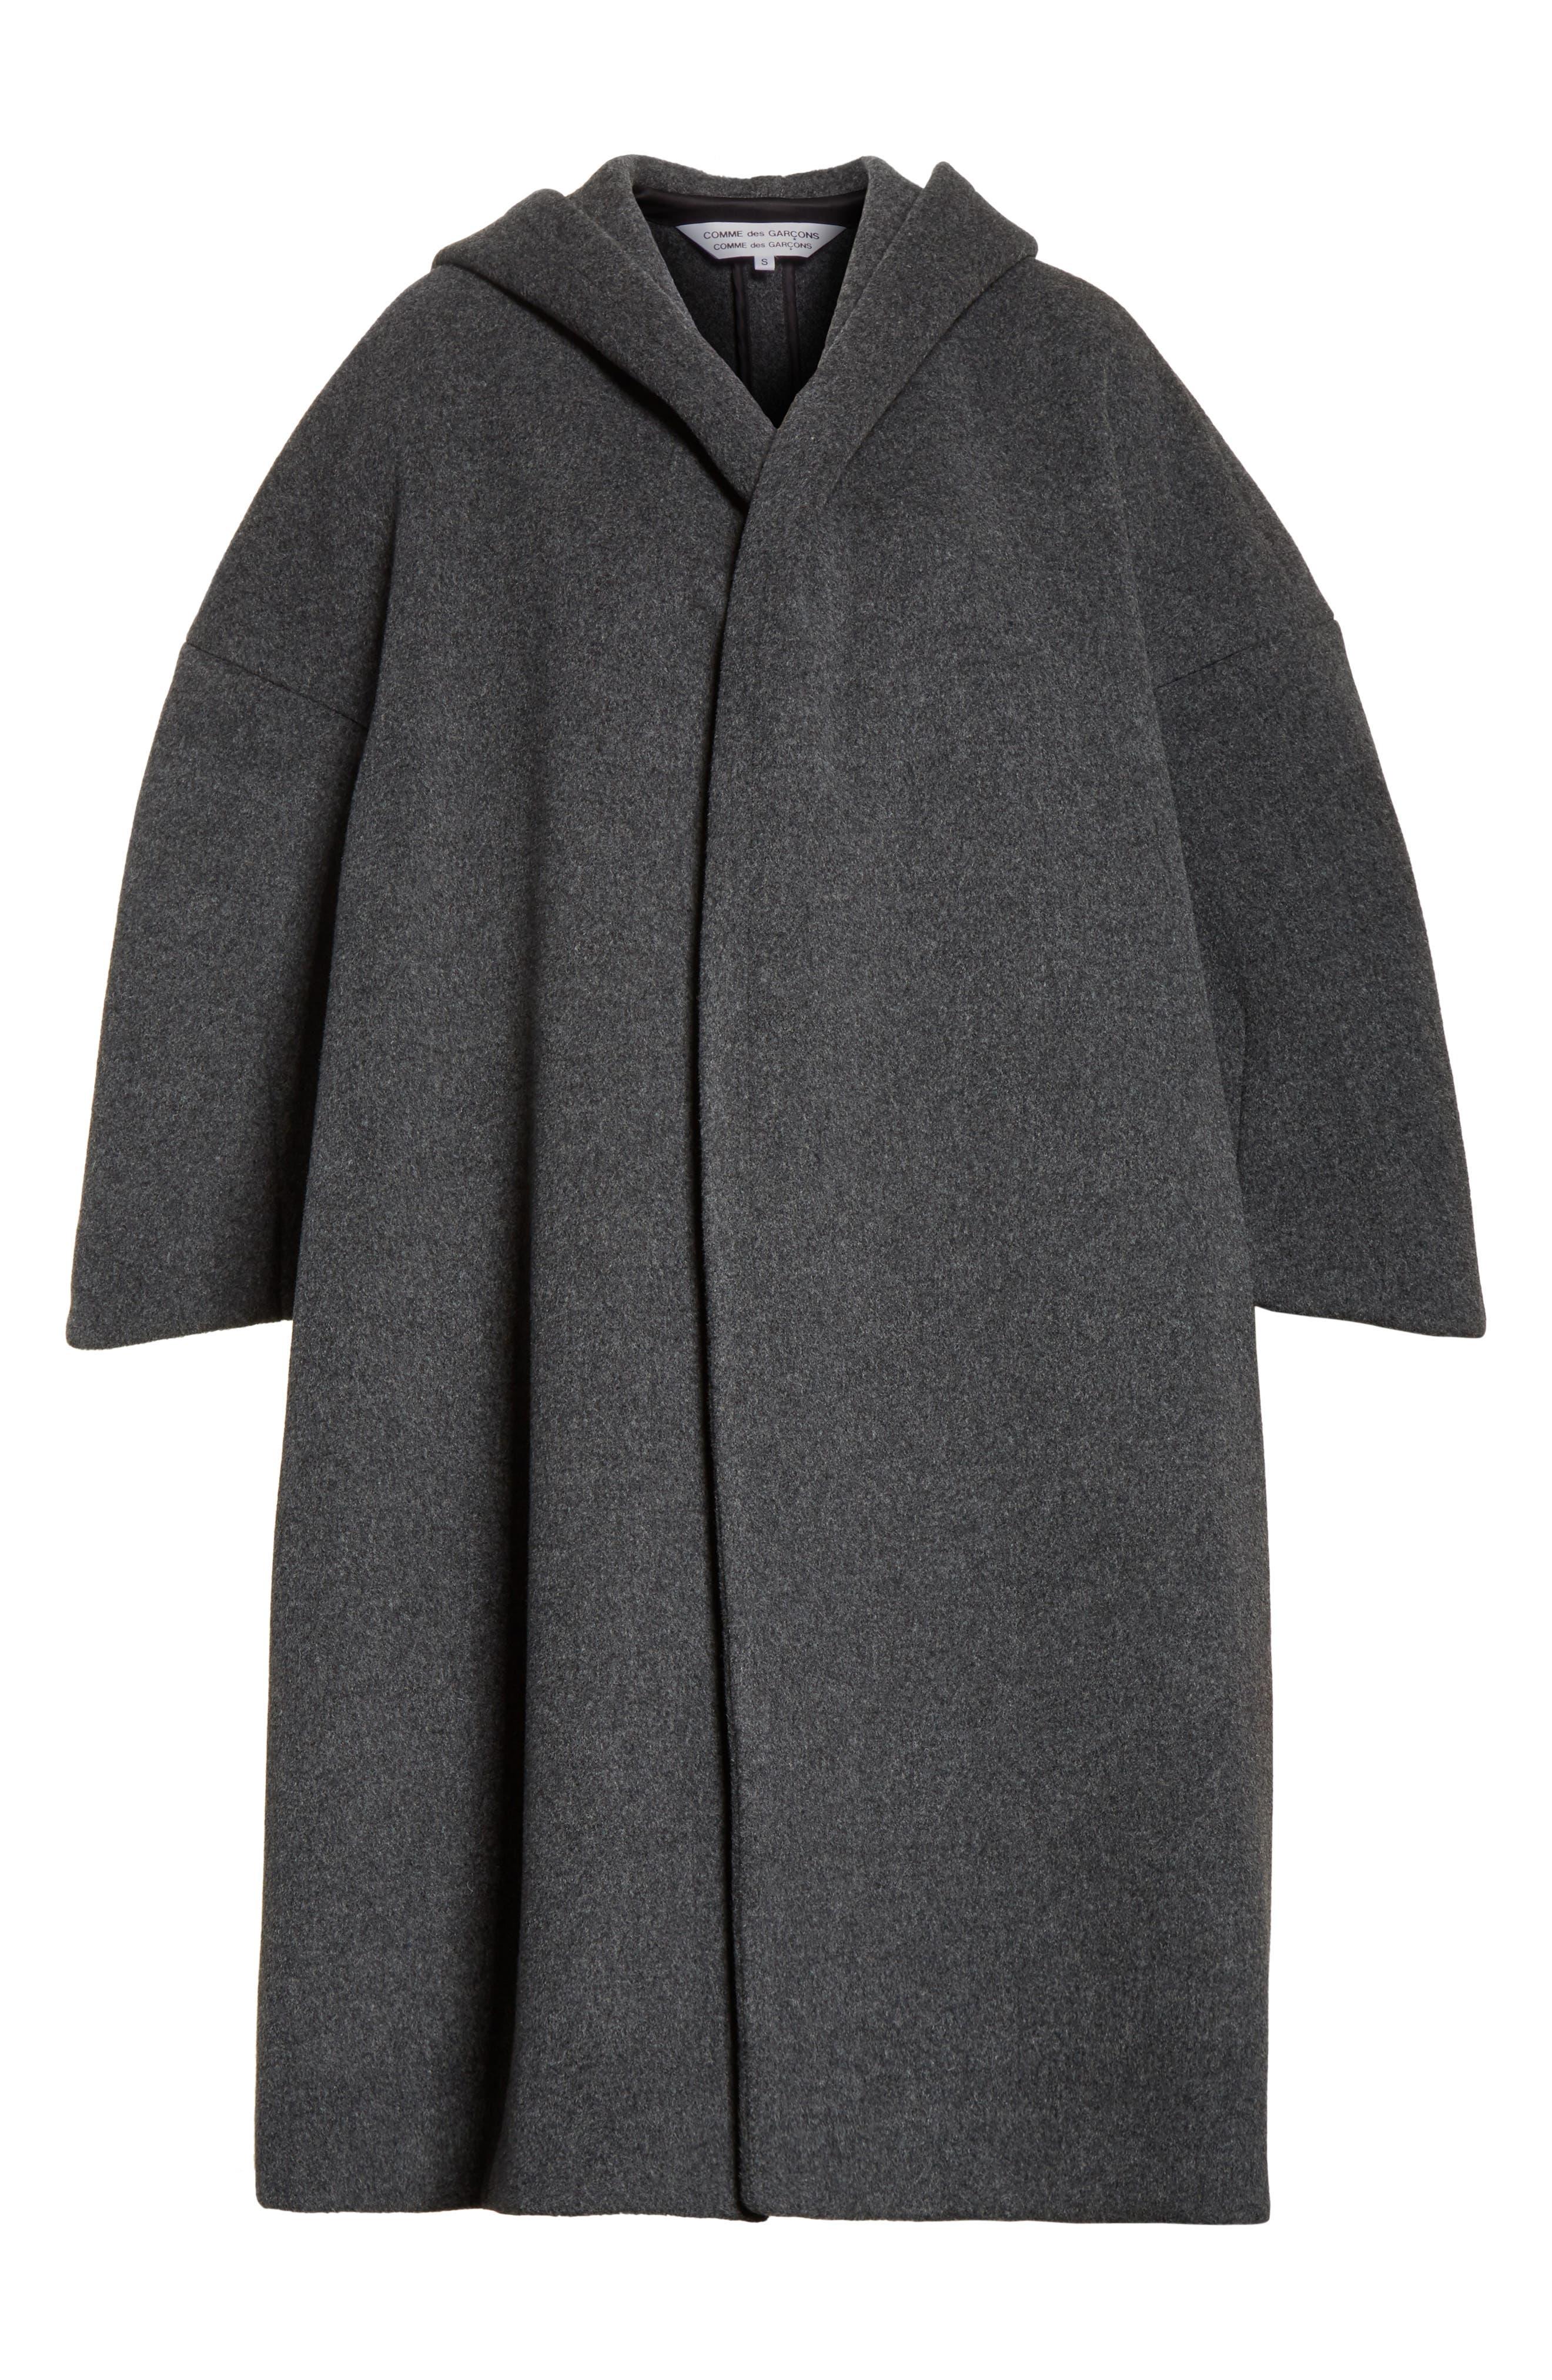 Long Hooded Wool Blend Coat,                             Alternate thumbnail 5, color,                             020